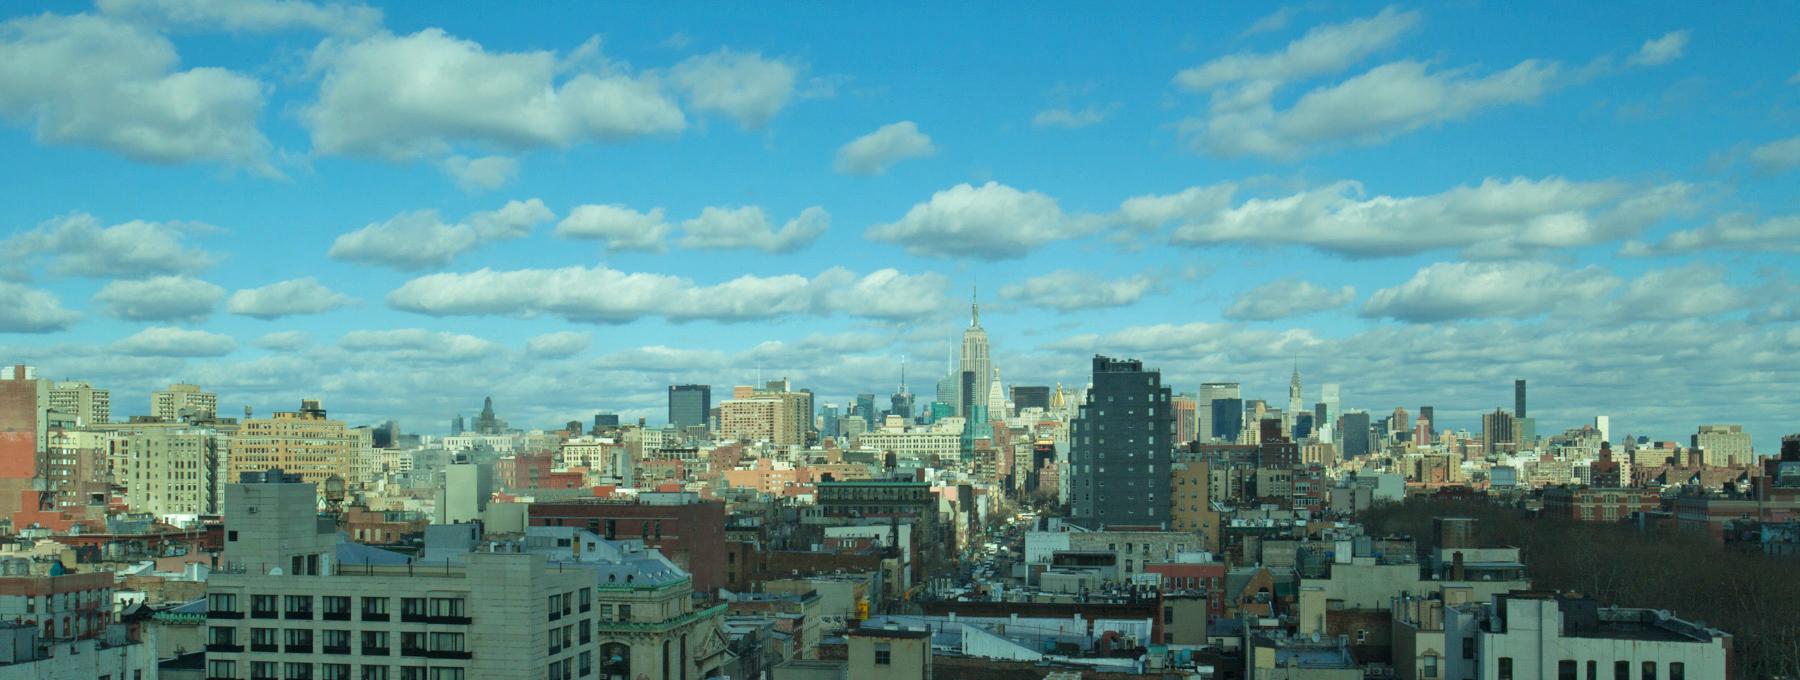 NYC (1 of 1).jpg